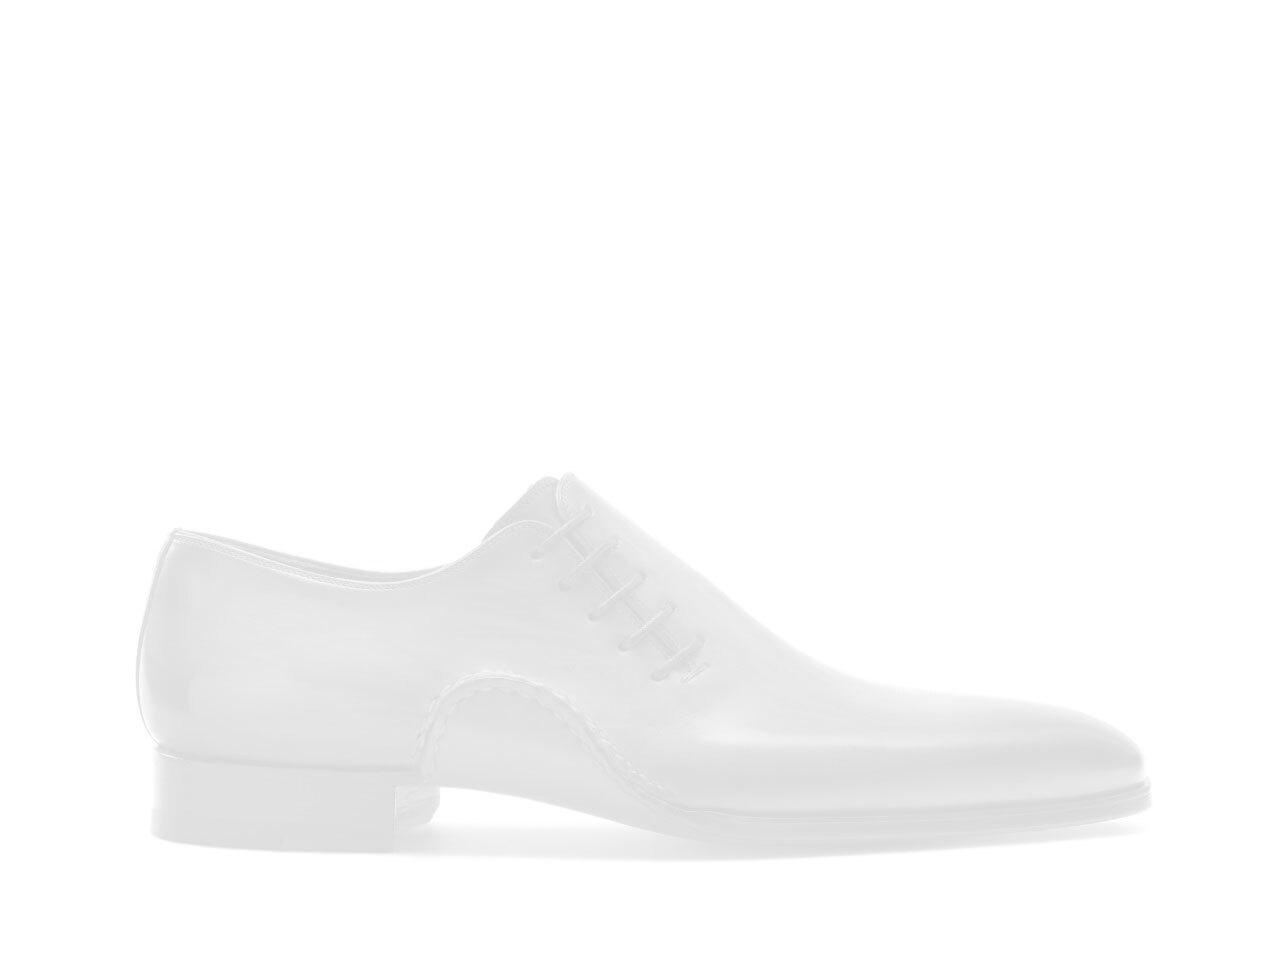 Side view of the Magnanni Ondara II Cognac Men's Double Monk Strap Shoes